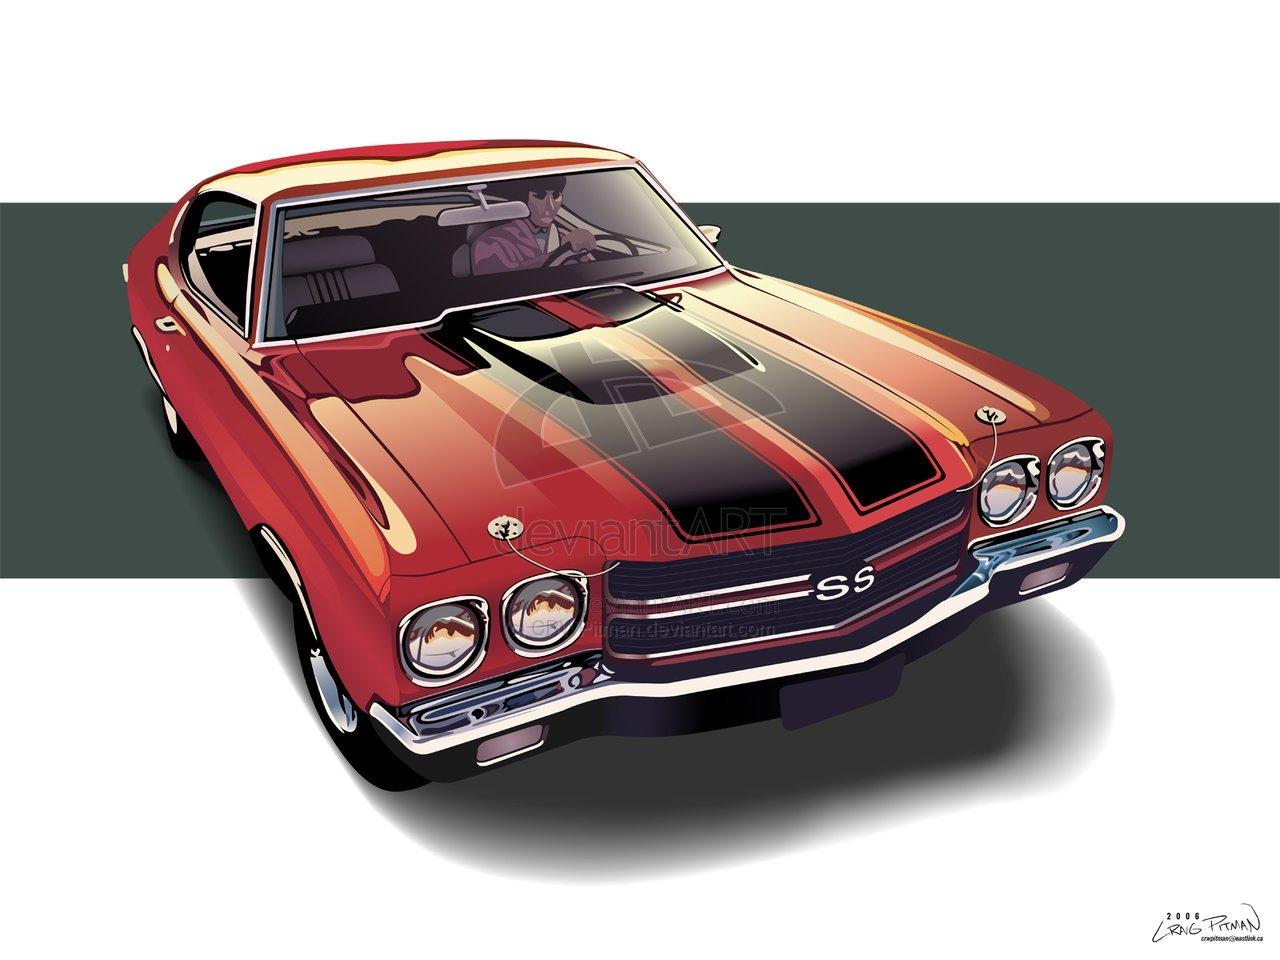 Chevrolet Chevelle SS LS6 Long Ratio laptimes, specs, performance